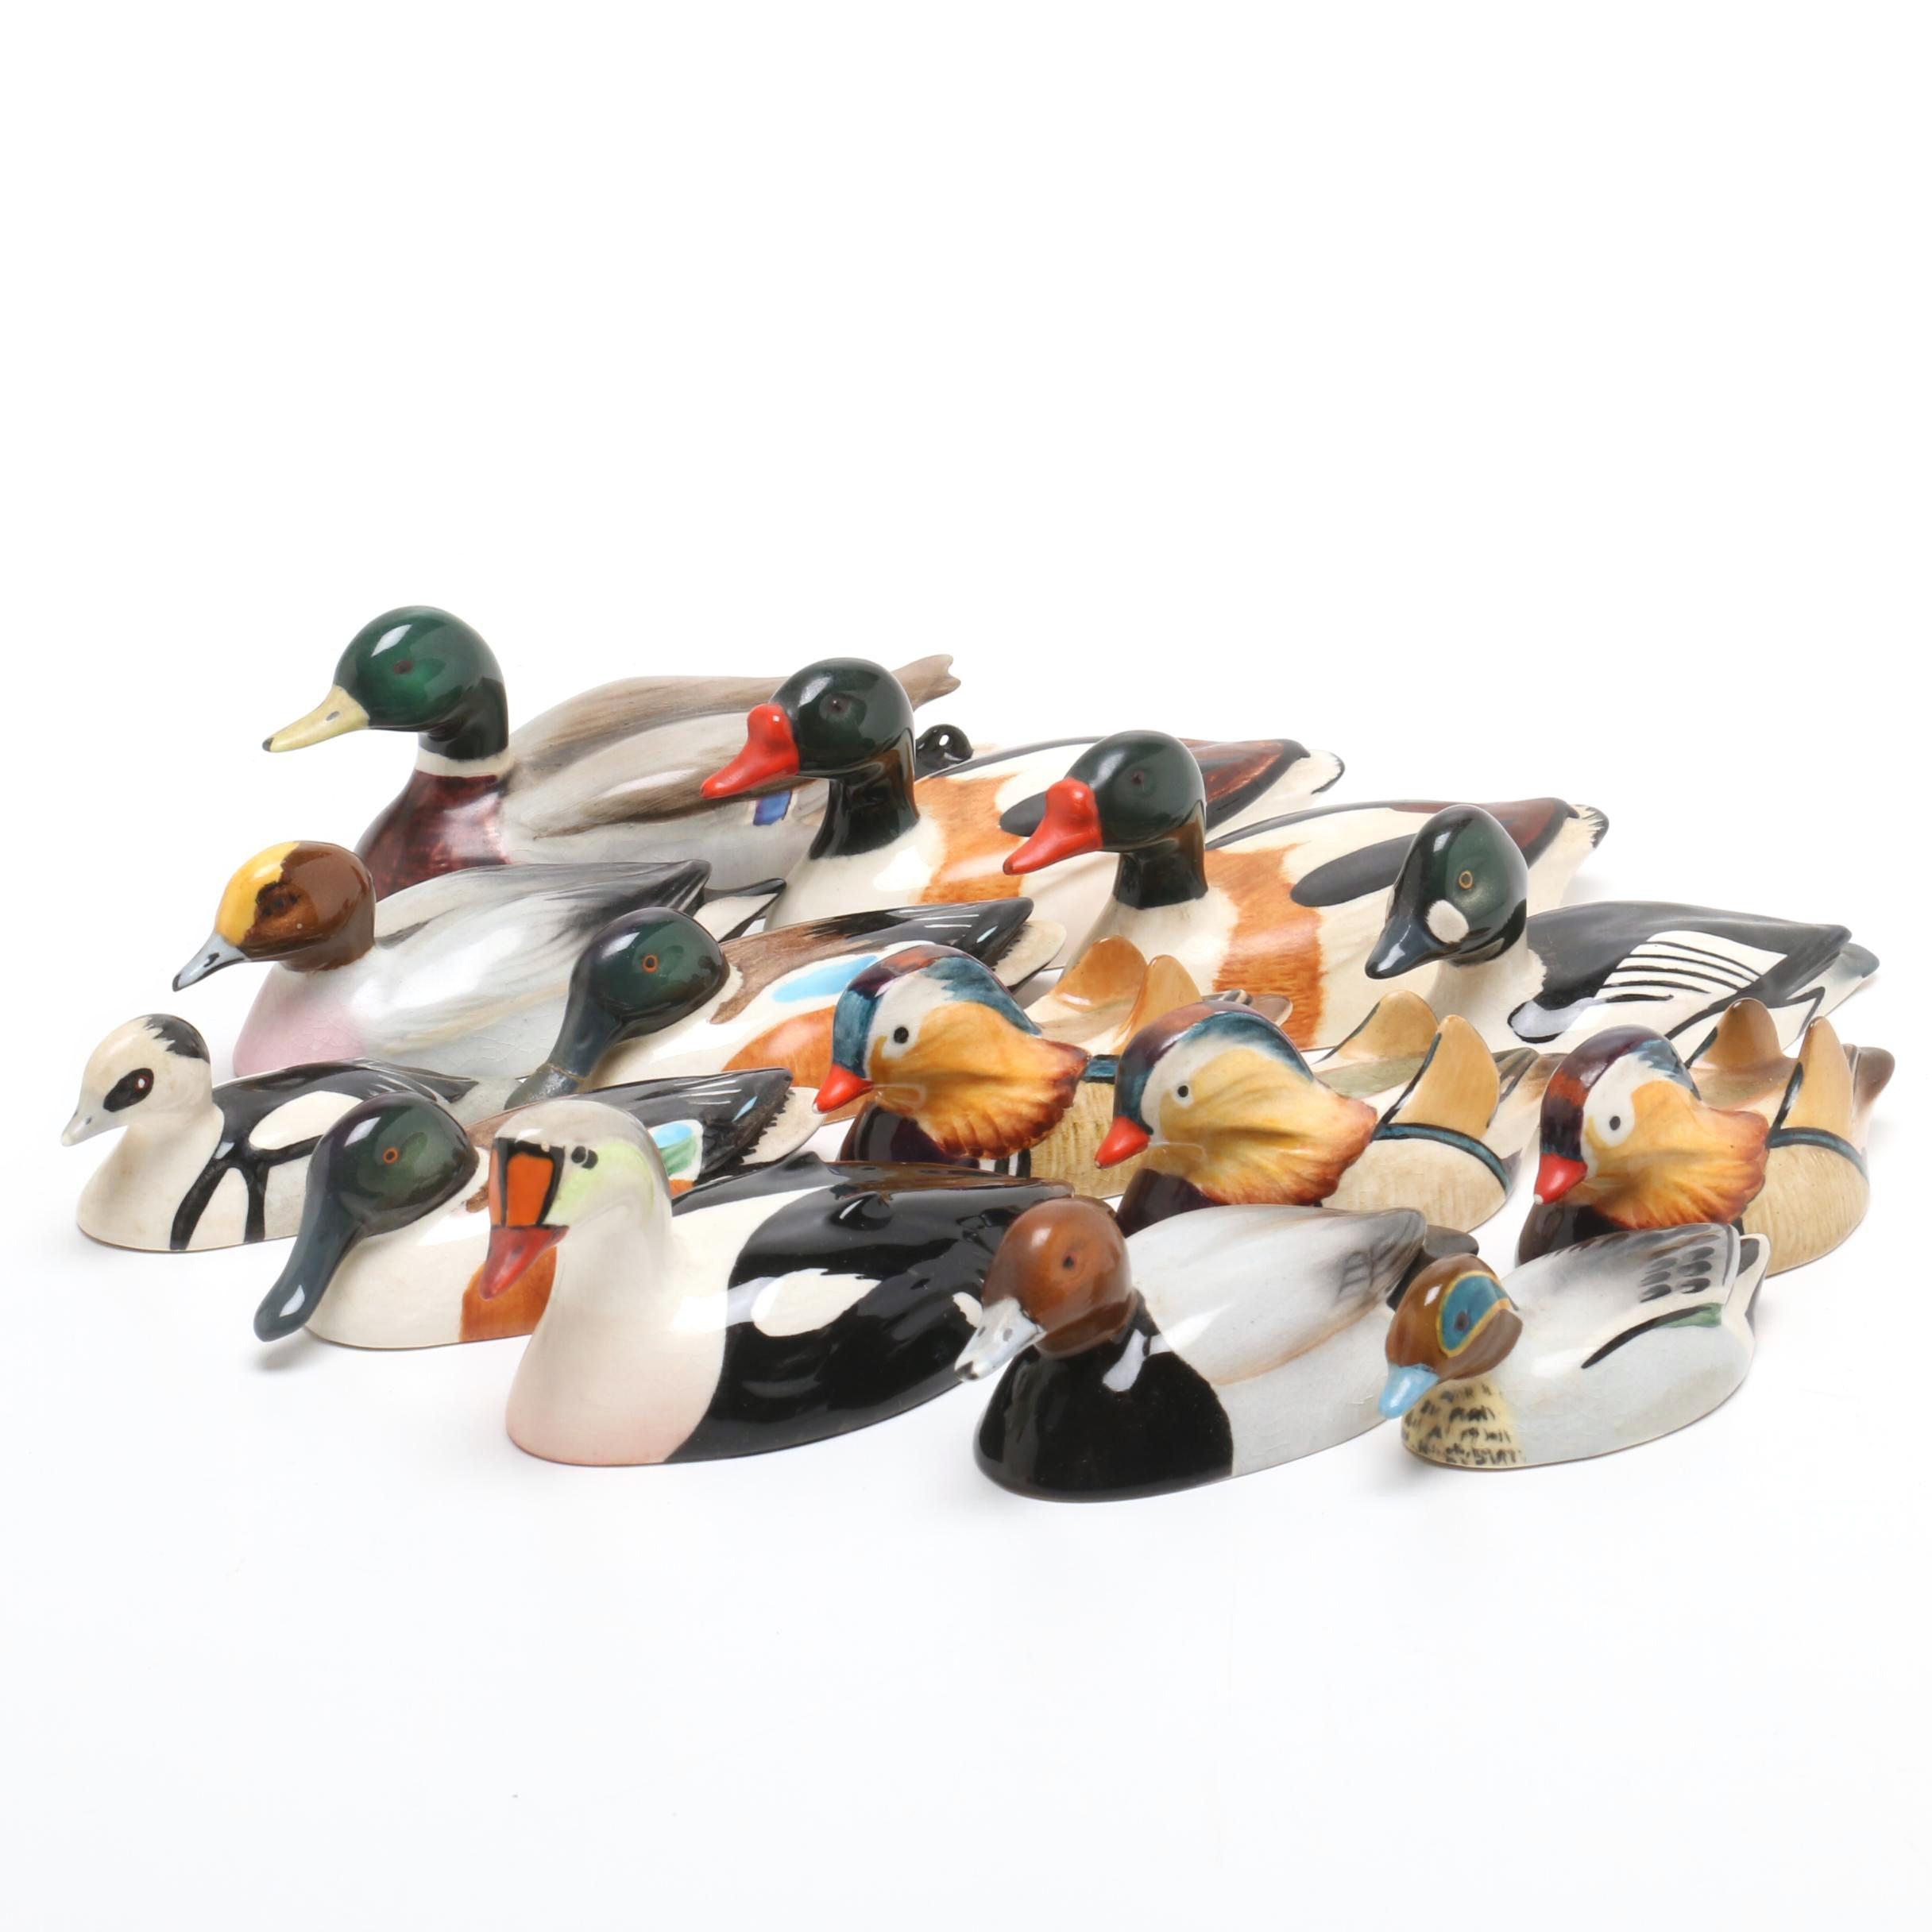 Porcelain Ducks by Peter Scott of Beswick England